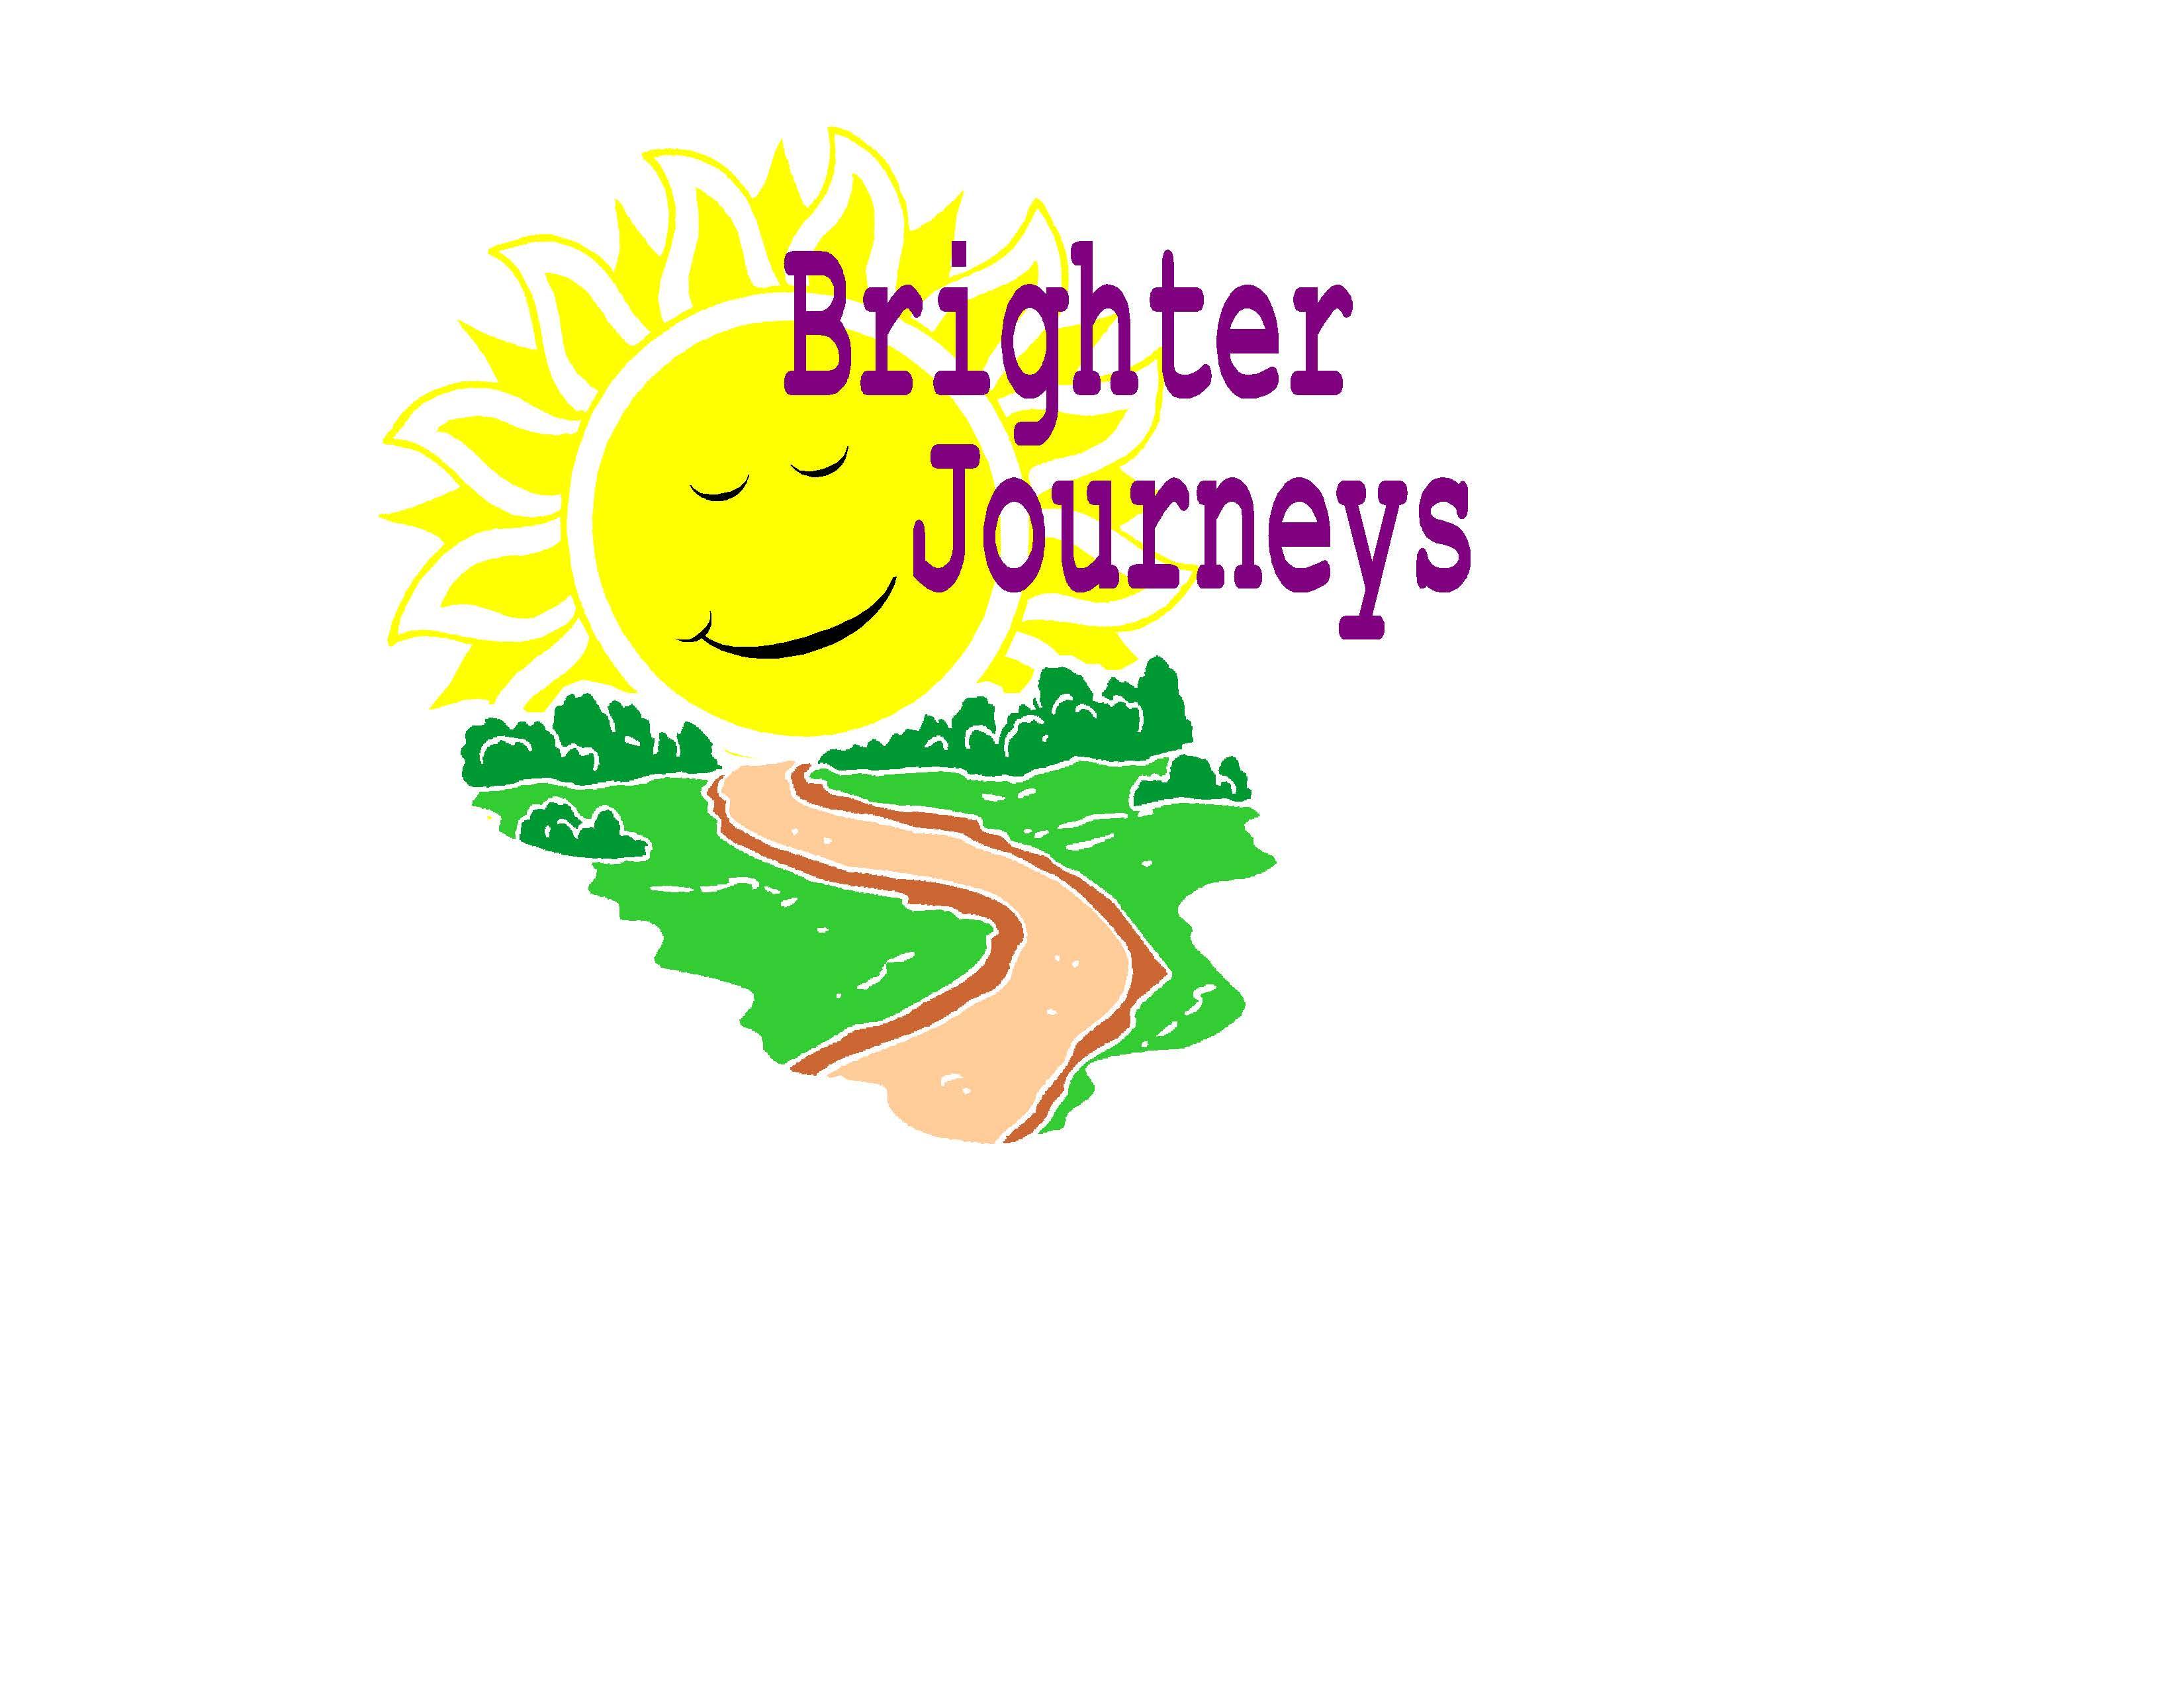 Brighter Journeys